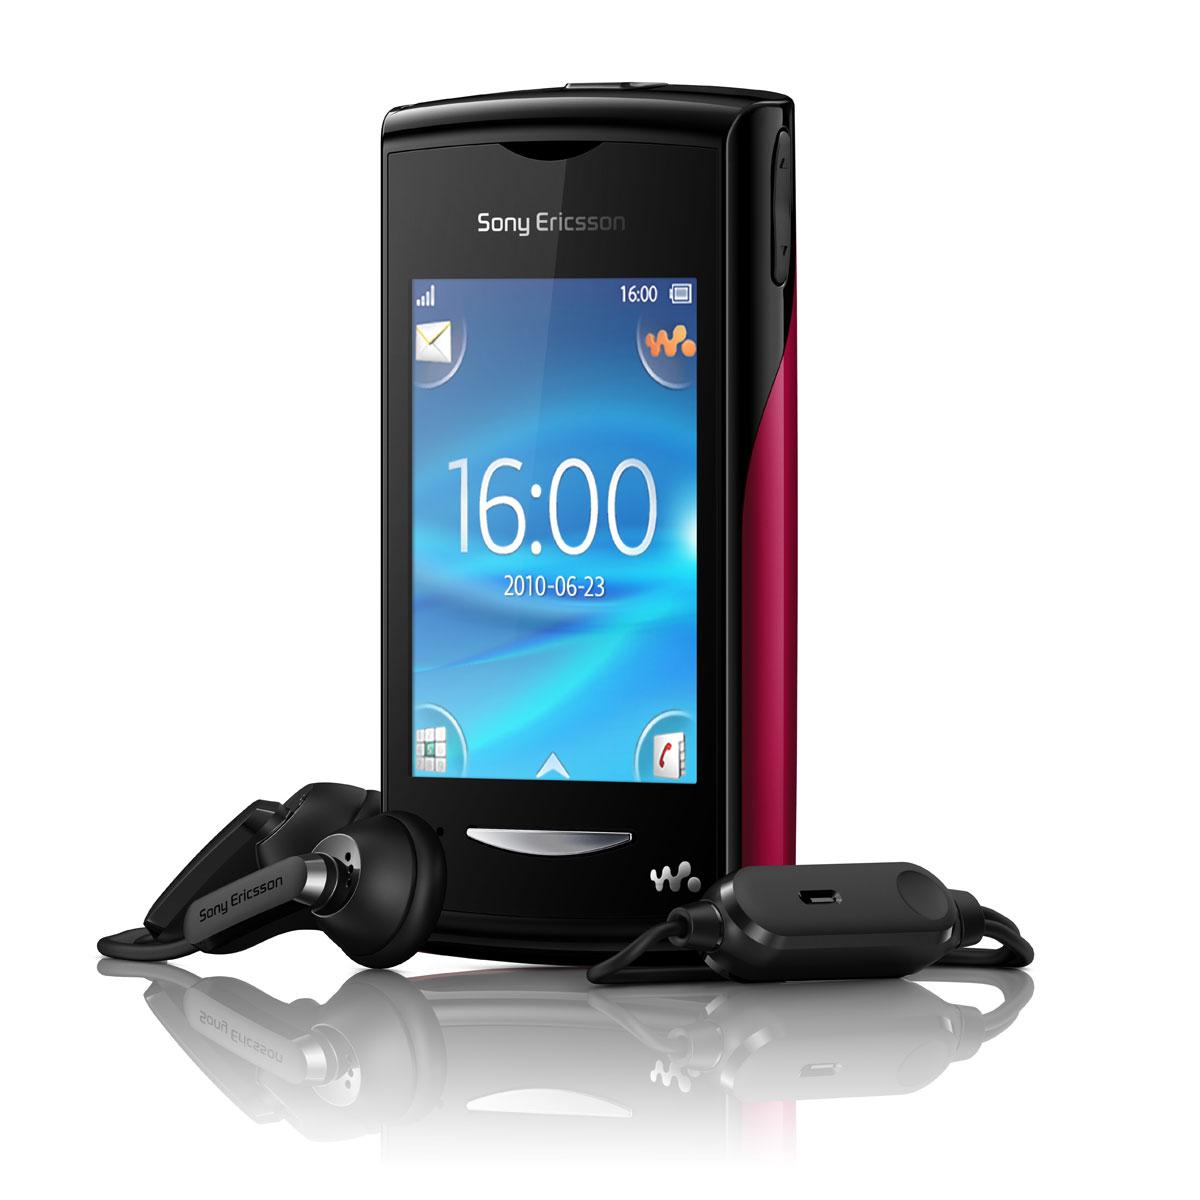 sony ericsson yendo w150 noir rouge mobile smartphone sony ericsson sur. Black Bedroom Furniture Sets. Home Design Ideas